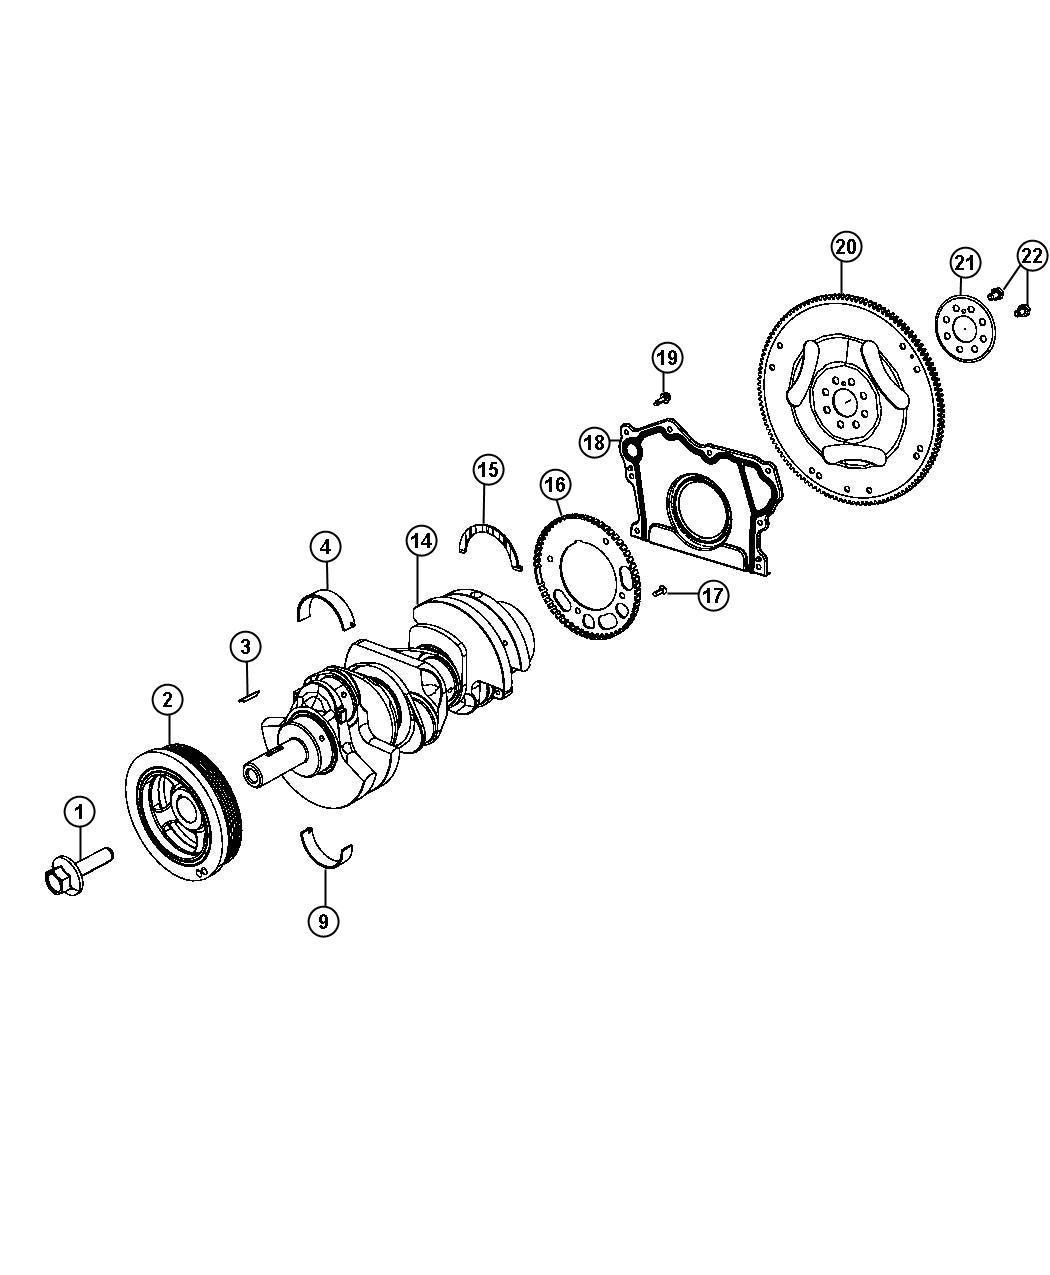 Chrysler 300 Damper Crankshaft Flywheel Engine